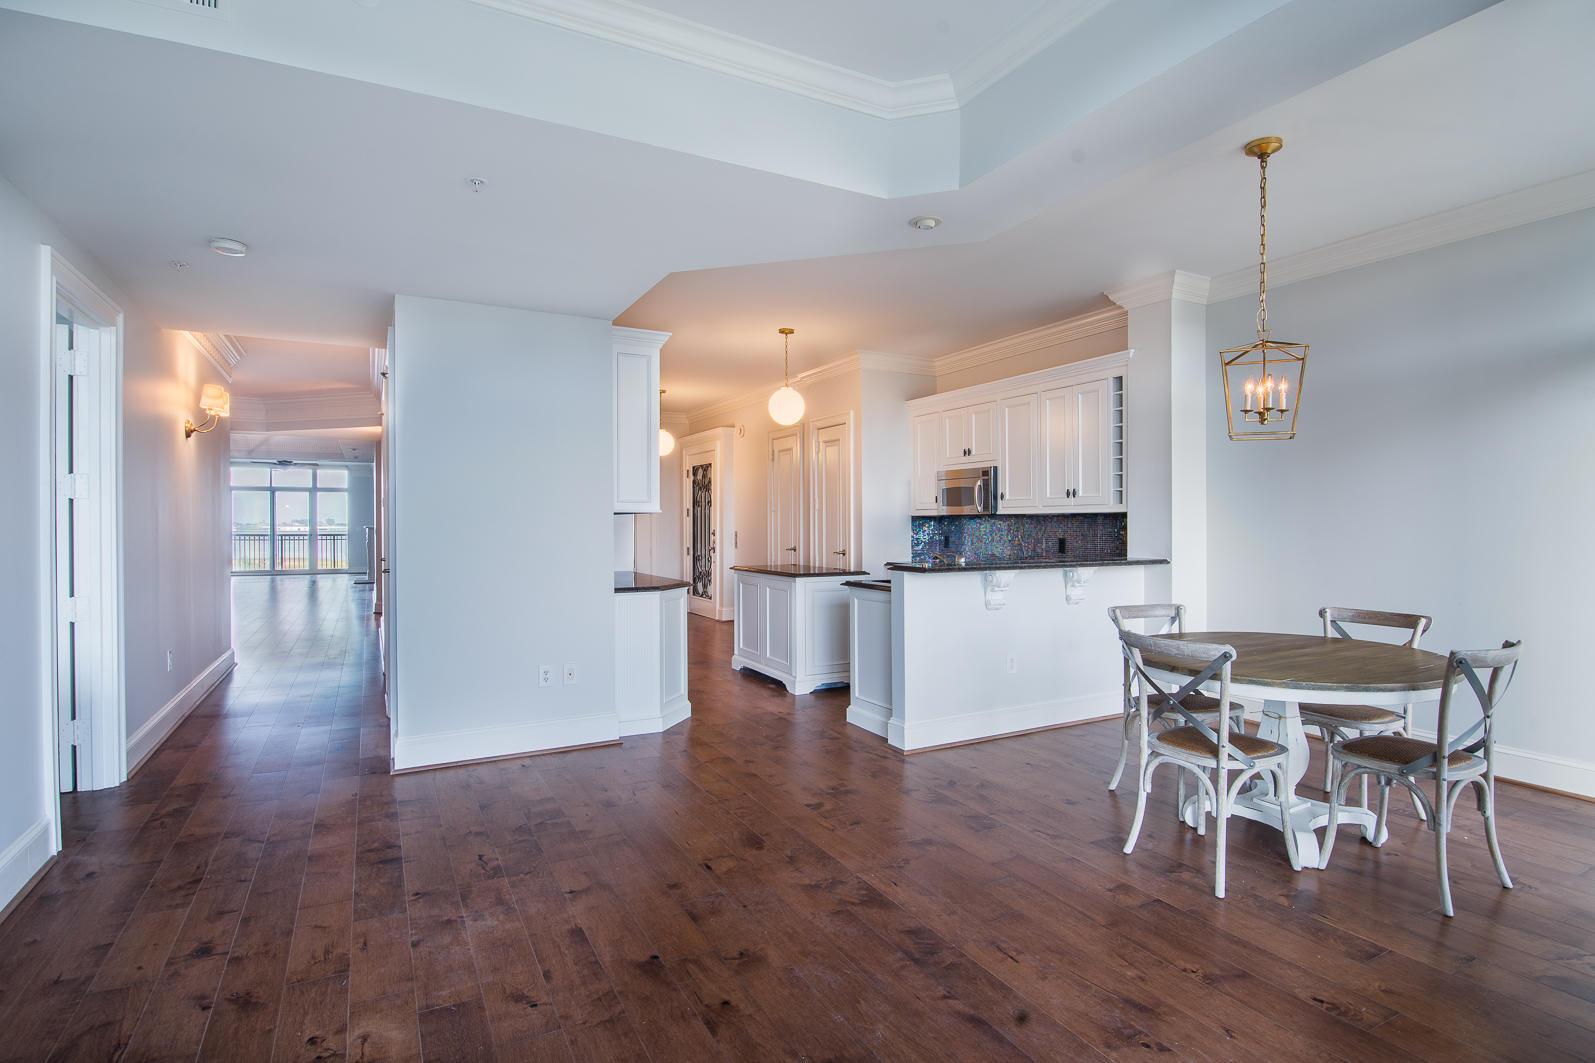 Renaissance On Chas Harbor Homes For Sale - 144 Plaza, Mount Pleasant, SC - 29